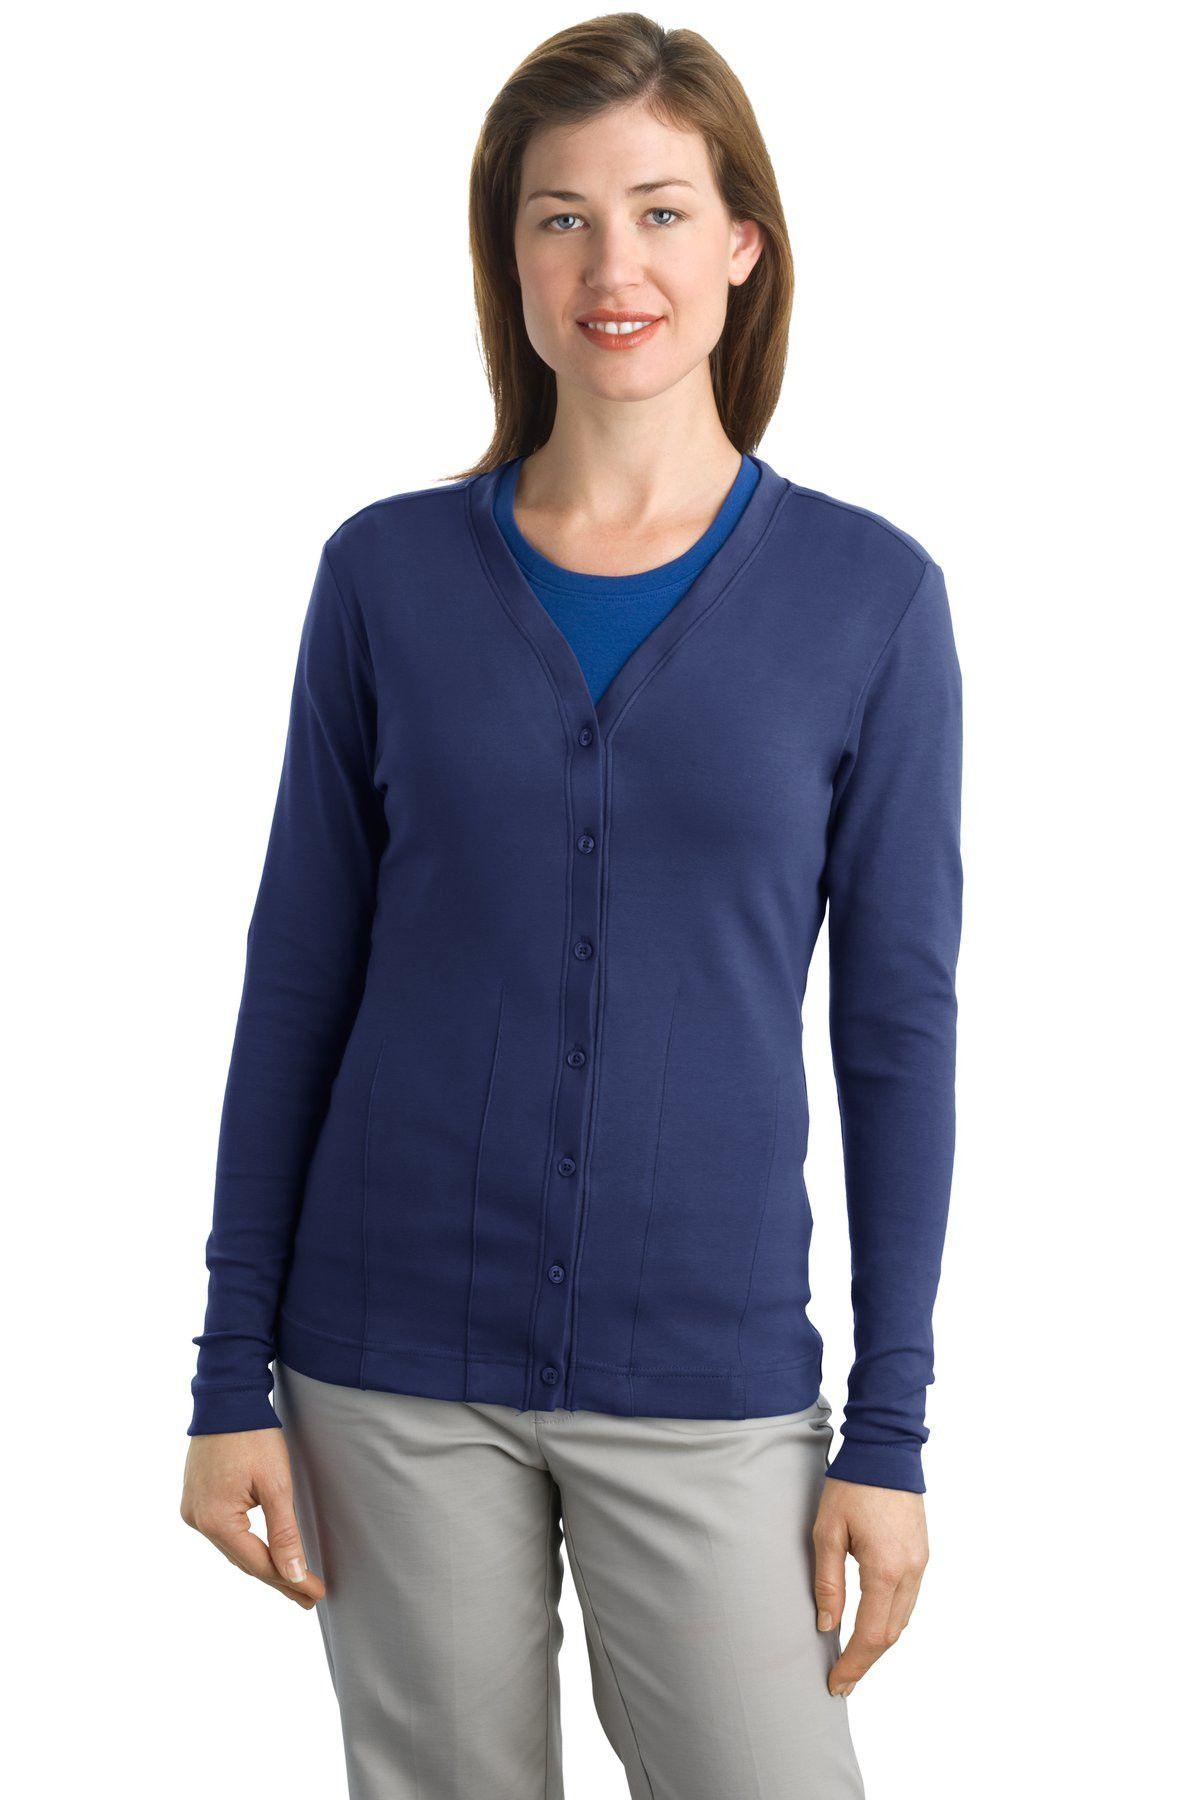 a6b6c5683b Port Authority Ladies Modern Stretch Cotton Cardigan. L515 Sapphire blue